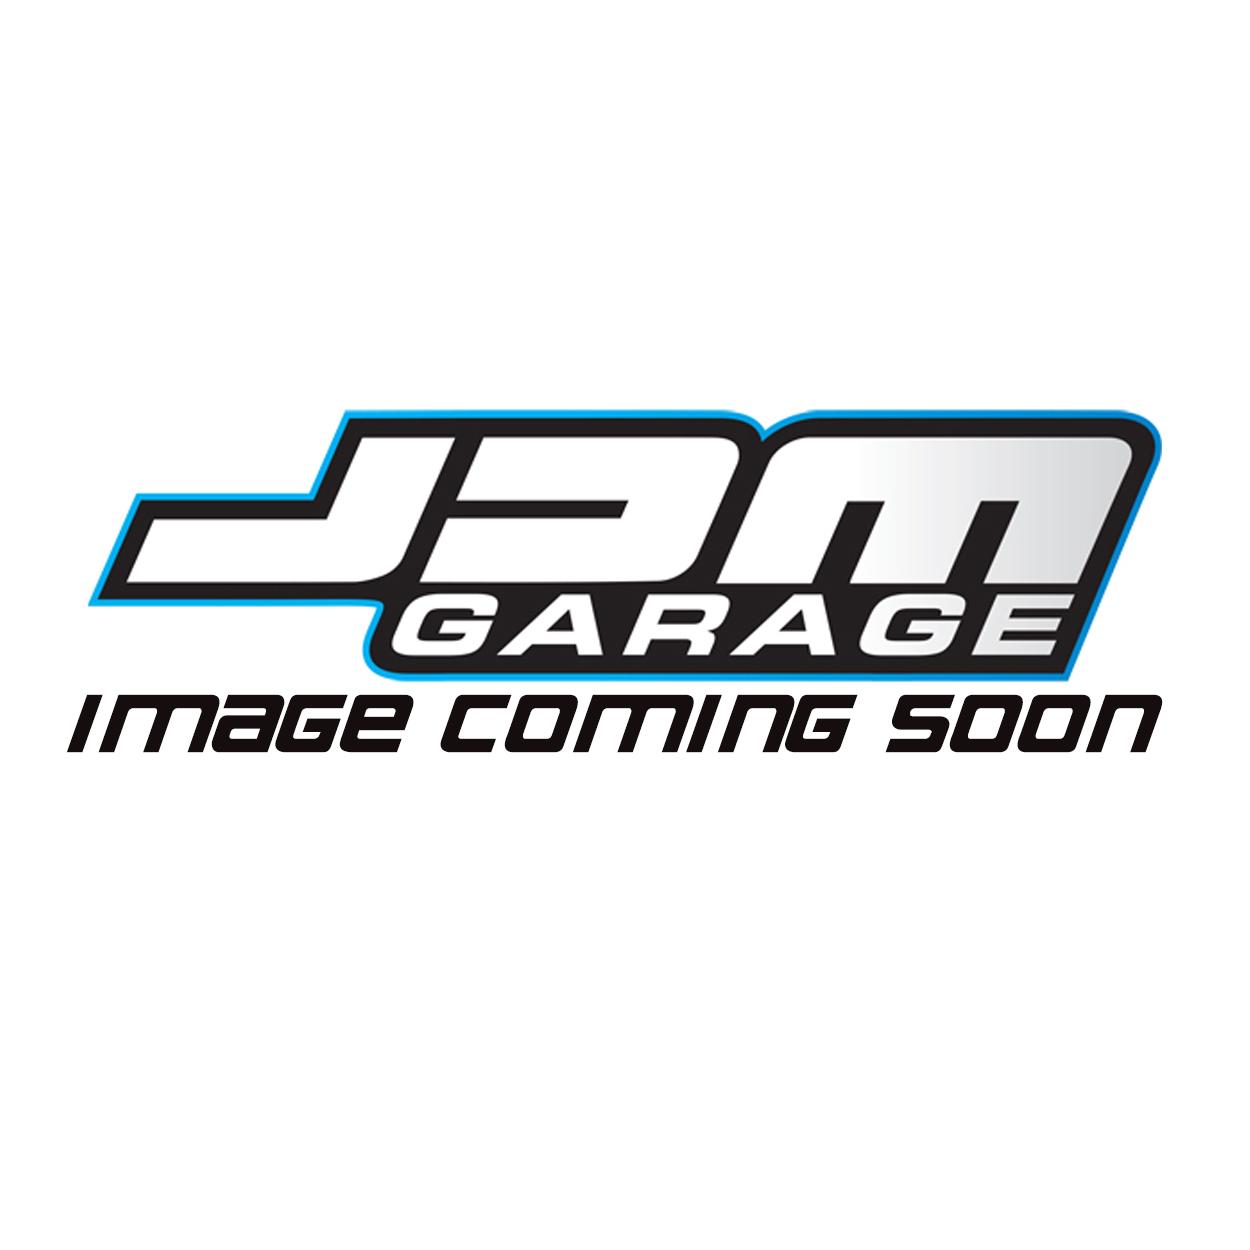 OE Timing Cam Belt Cambelt Fits Subaru Impreza EJ154 EJ204 EJ205 EJ207 EJ255 EJ257 13028-AA072